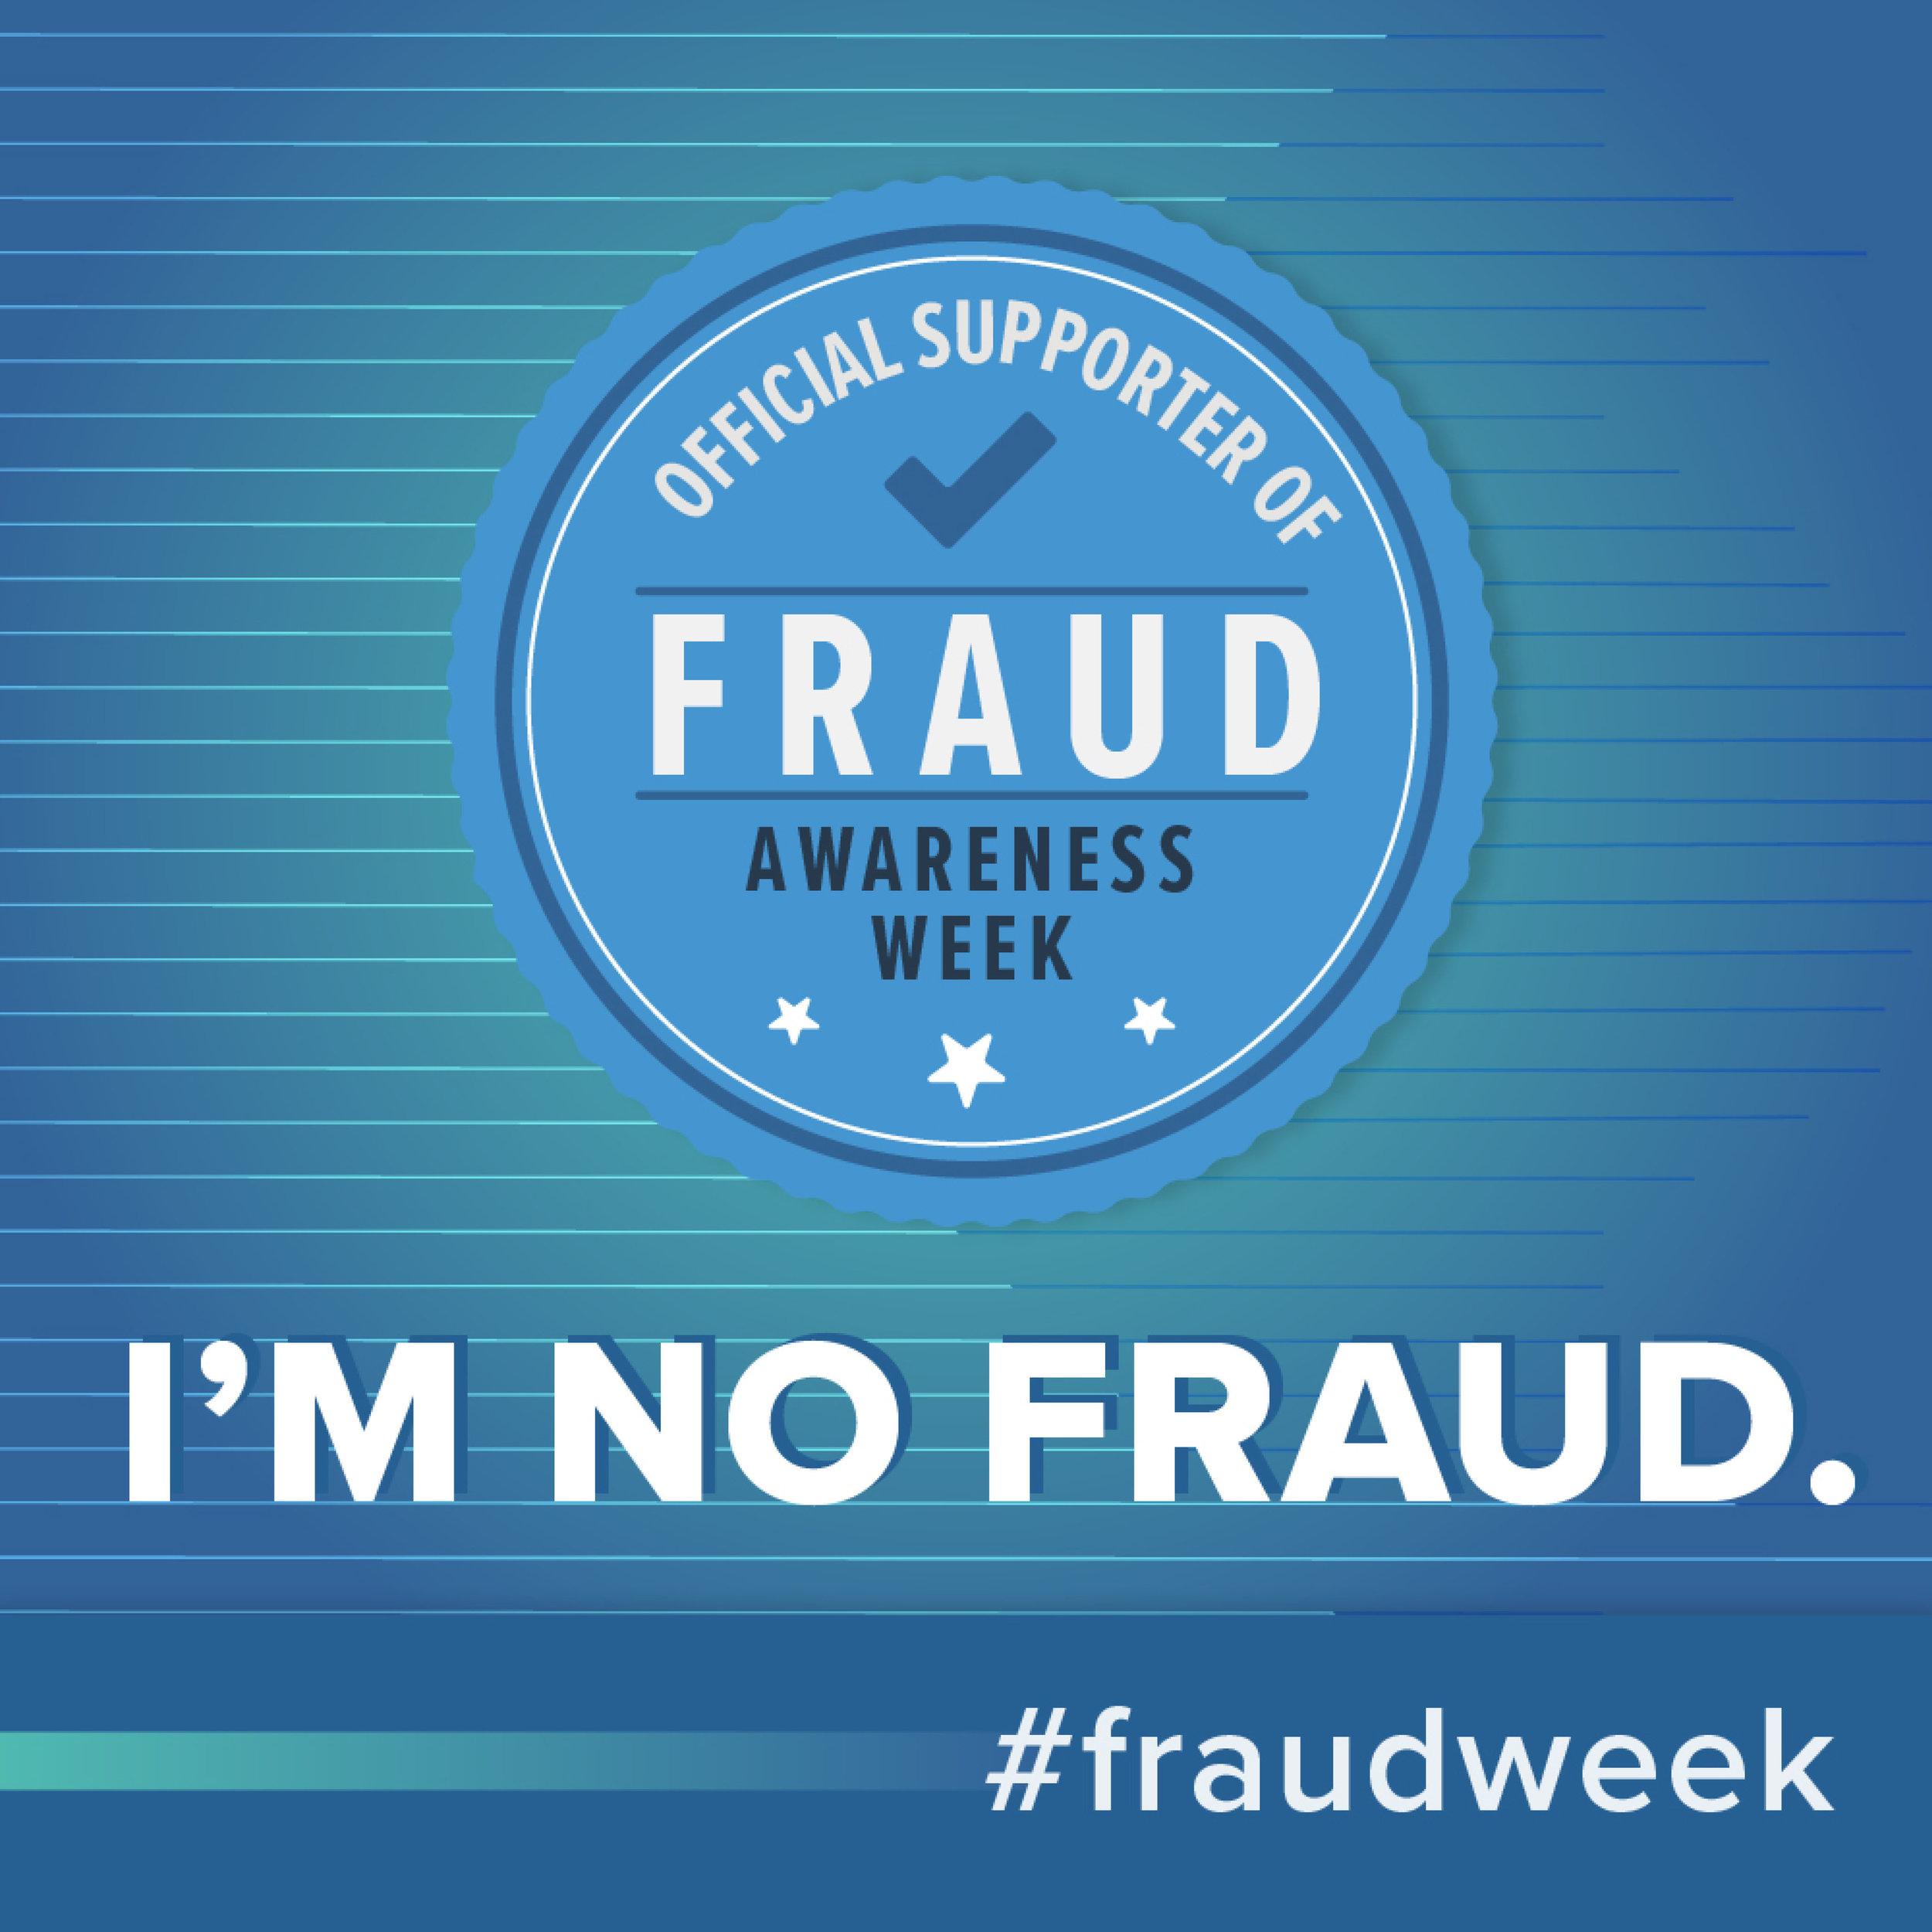 fraud-week-2019-official-supporter-1.jpg